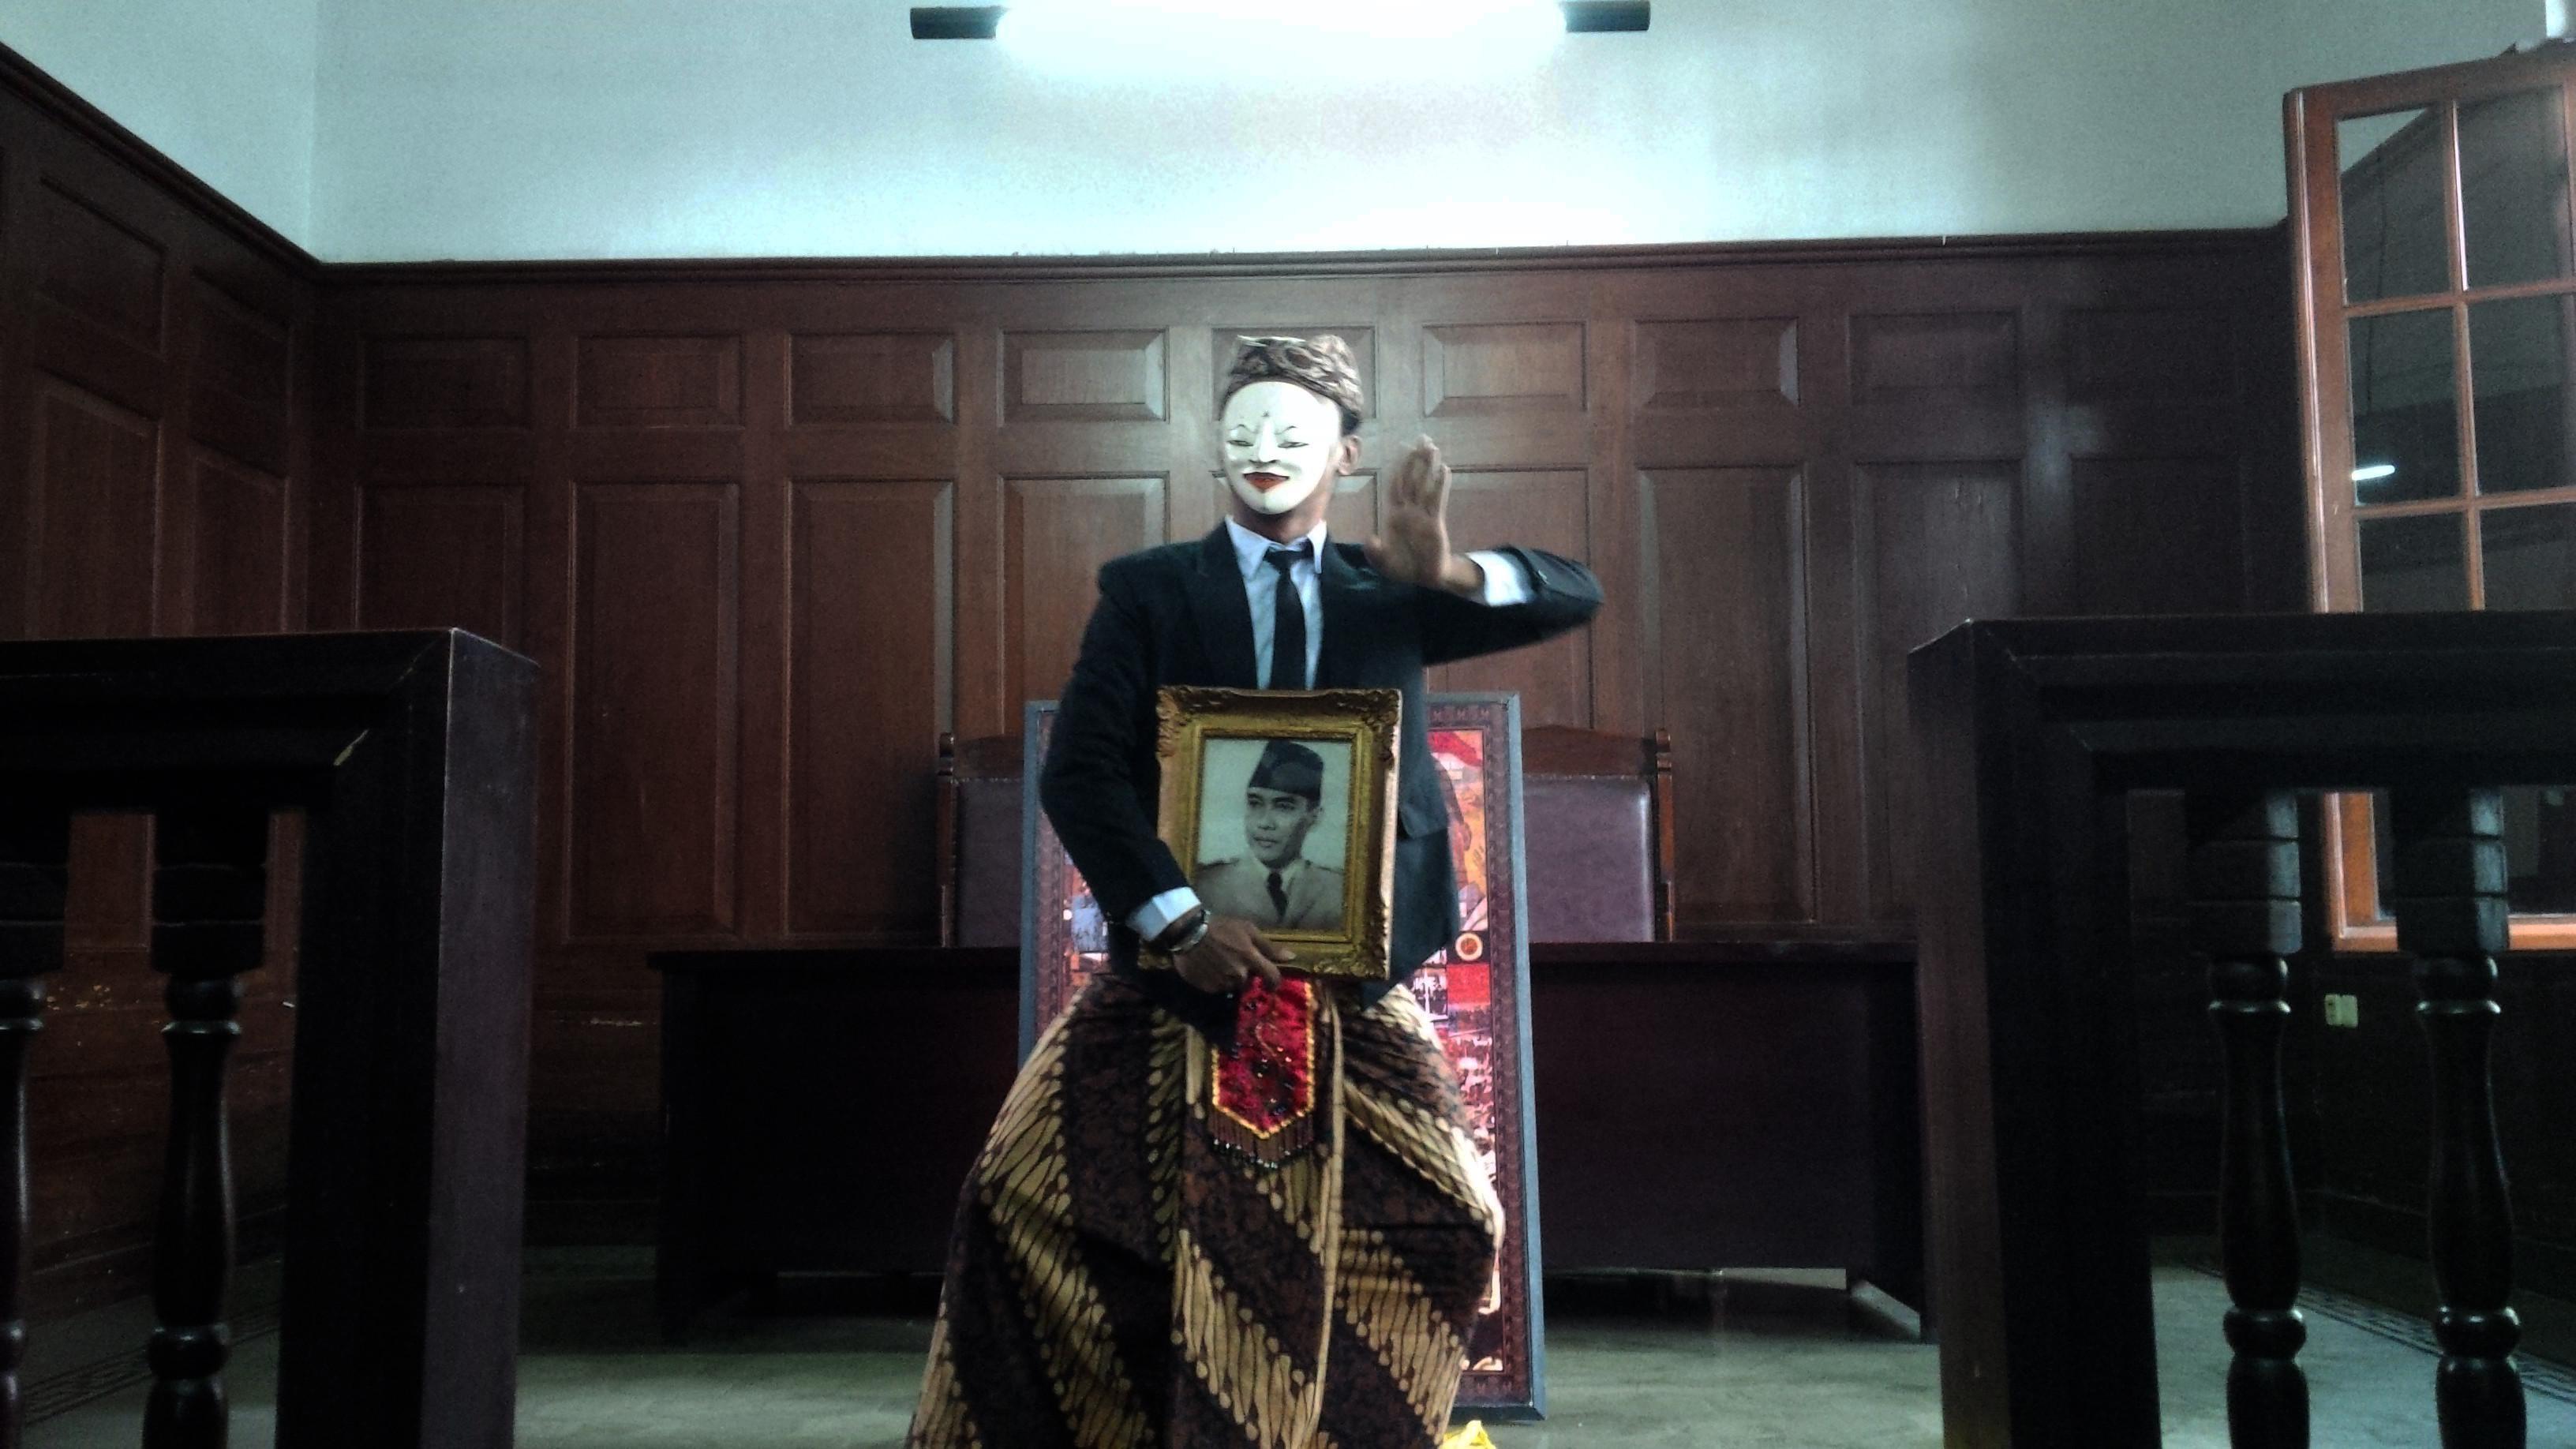 Mengenakan pakaian seperti mahasiswa tempo dulu, Gatot Gunawan seniman tari asal Kota Bandung menari selama enam jam sambil membawa foto Presiden pertama RI Sukarno. (Liputan6.com/Aditya Prakasa)